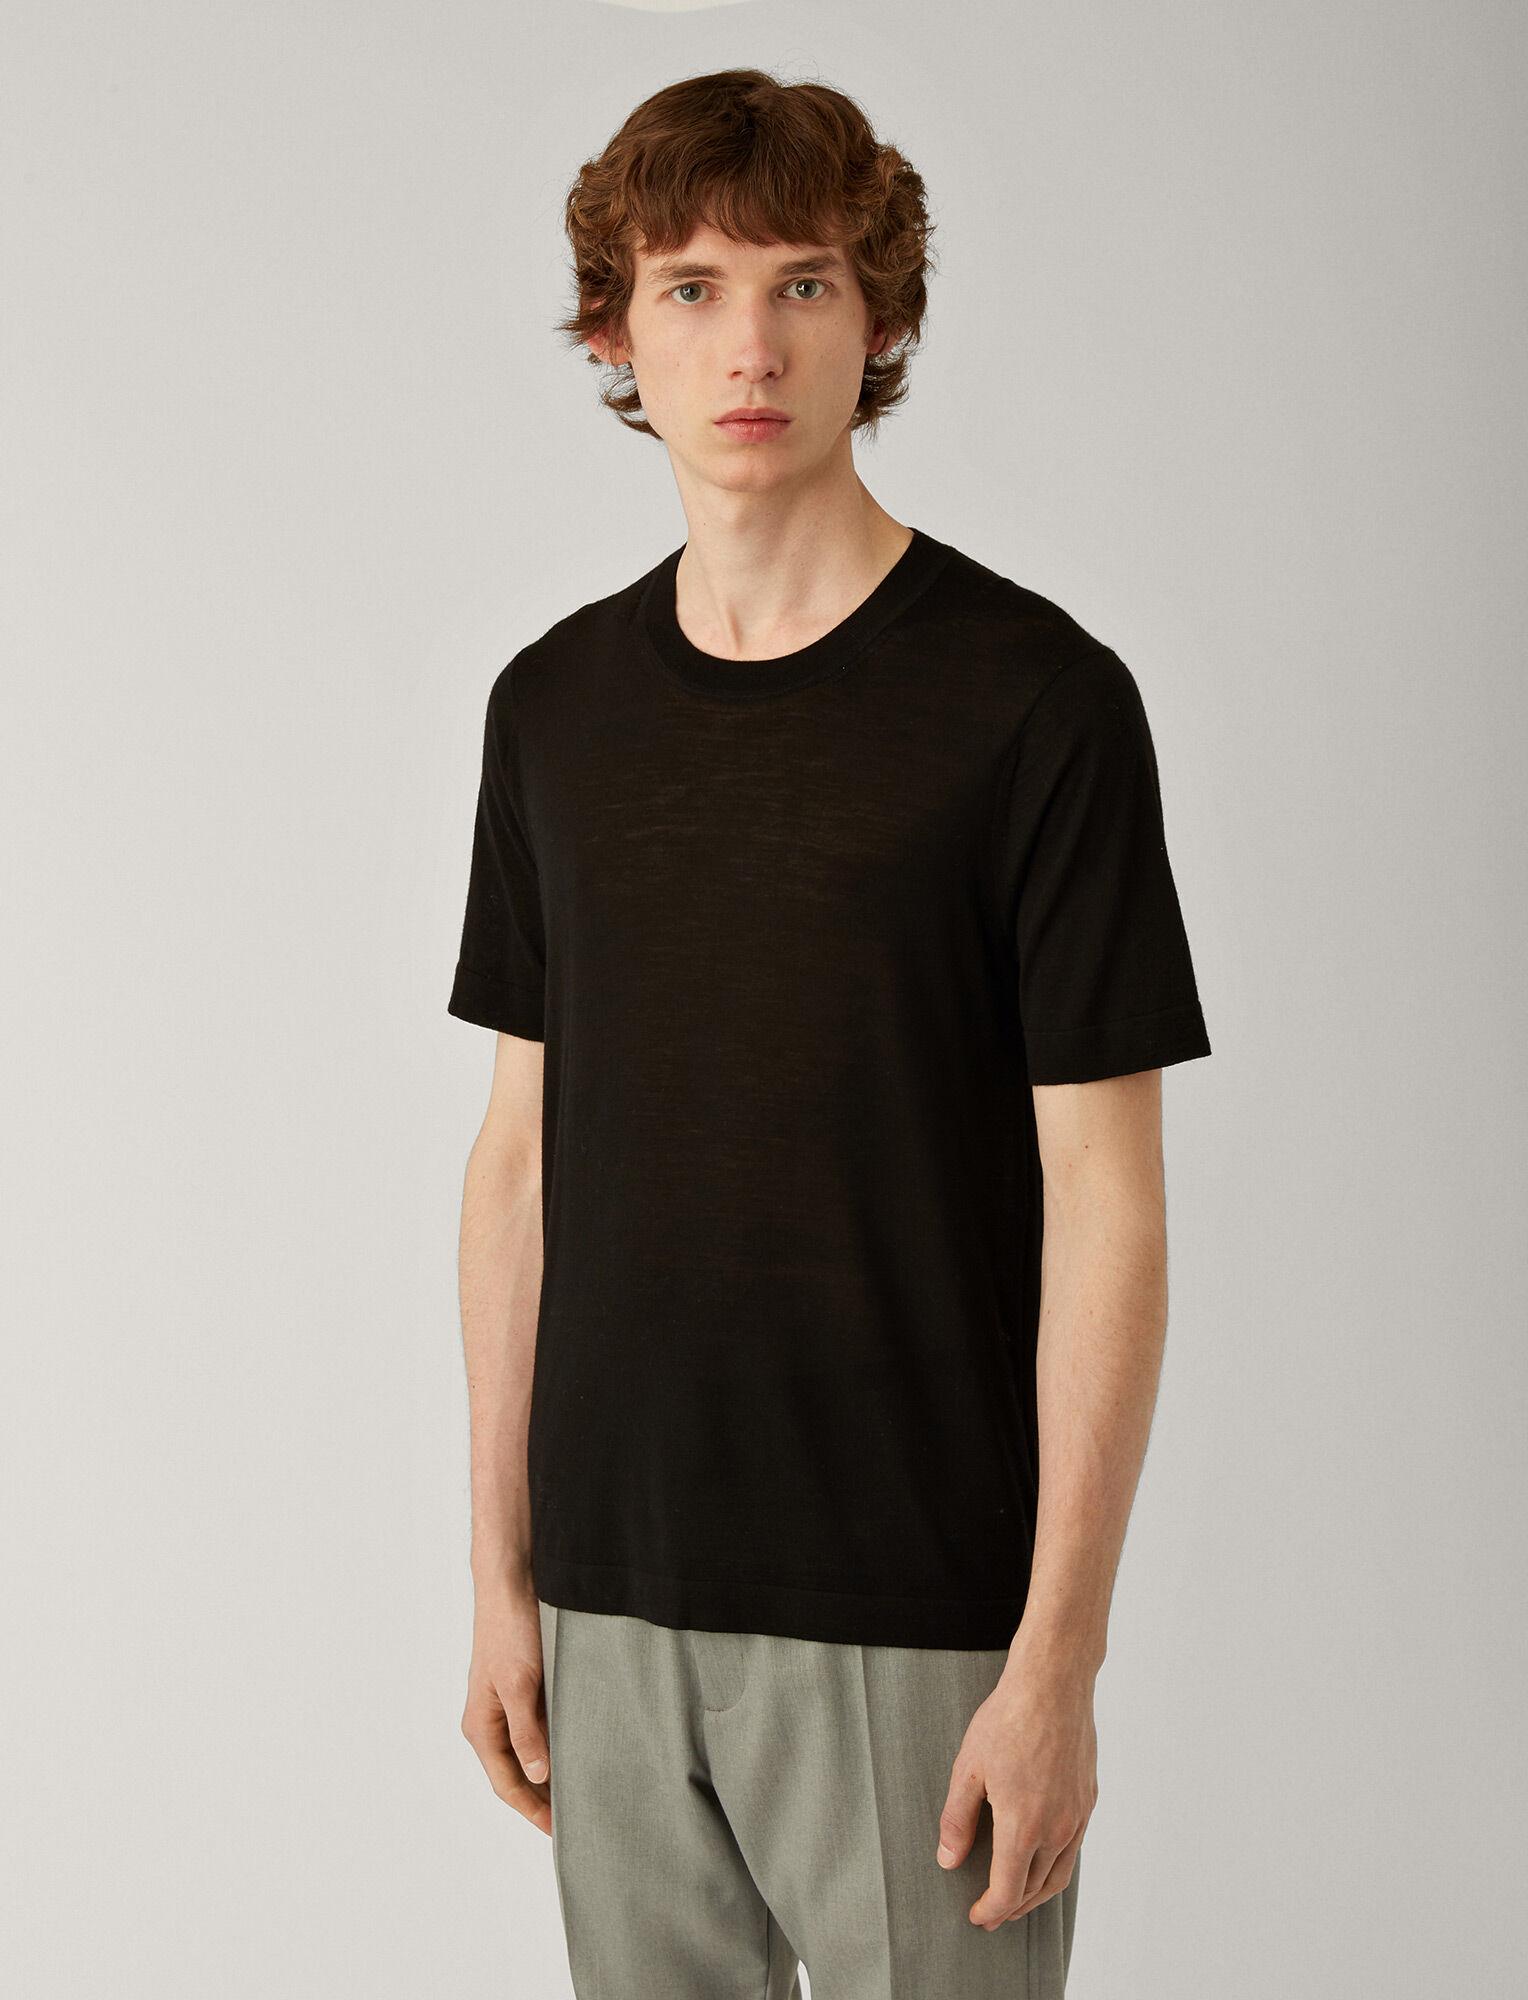 Joseph, Tee-shirt léger en laine mérinos, in BLACK